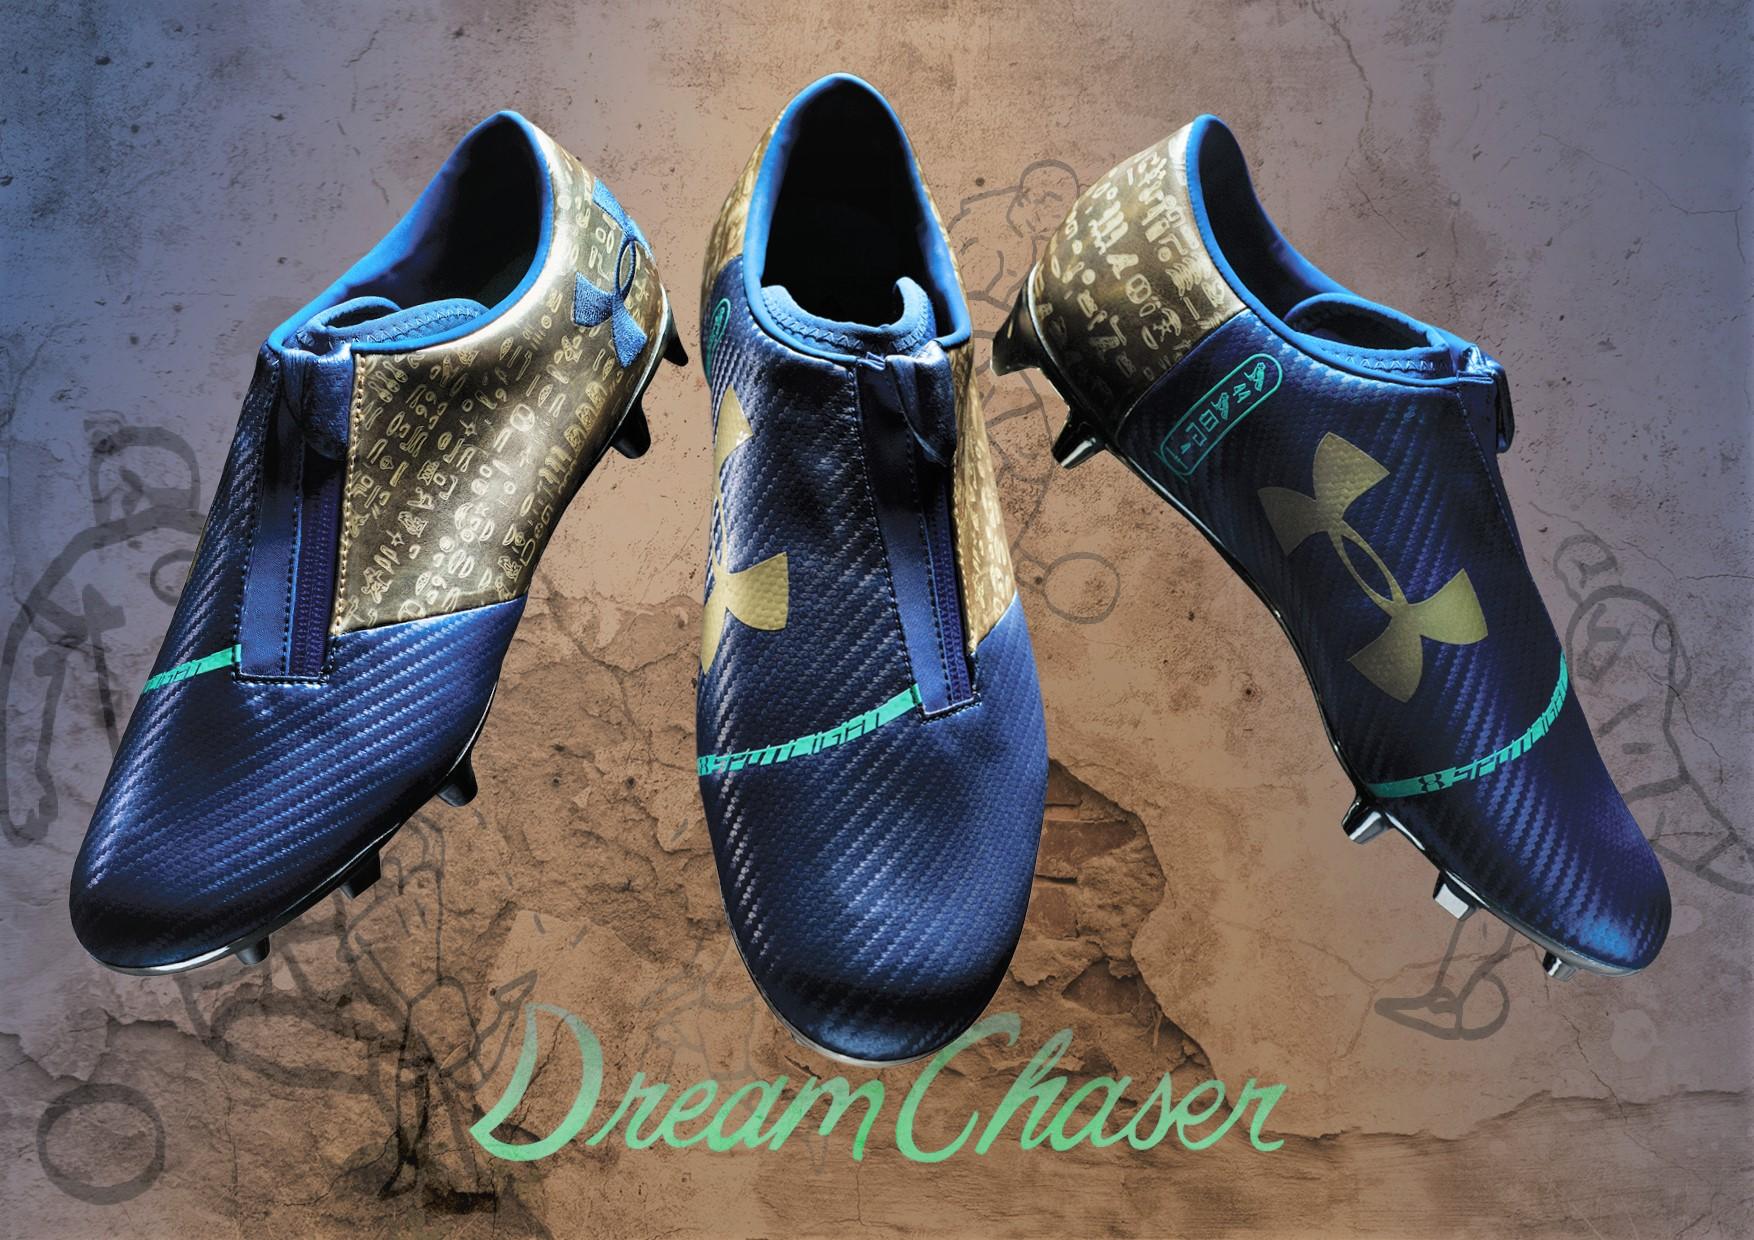 Memphis Depay X Under Armour Spotlight Dream Chaser Soccer